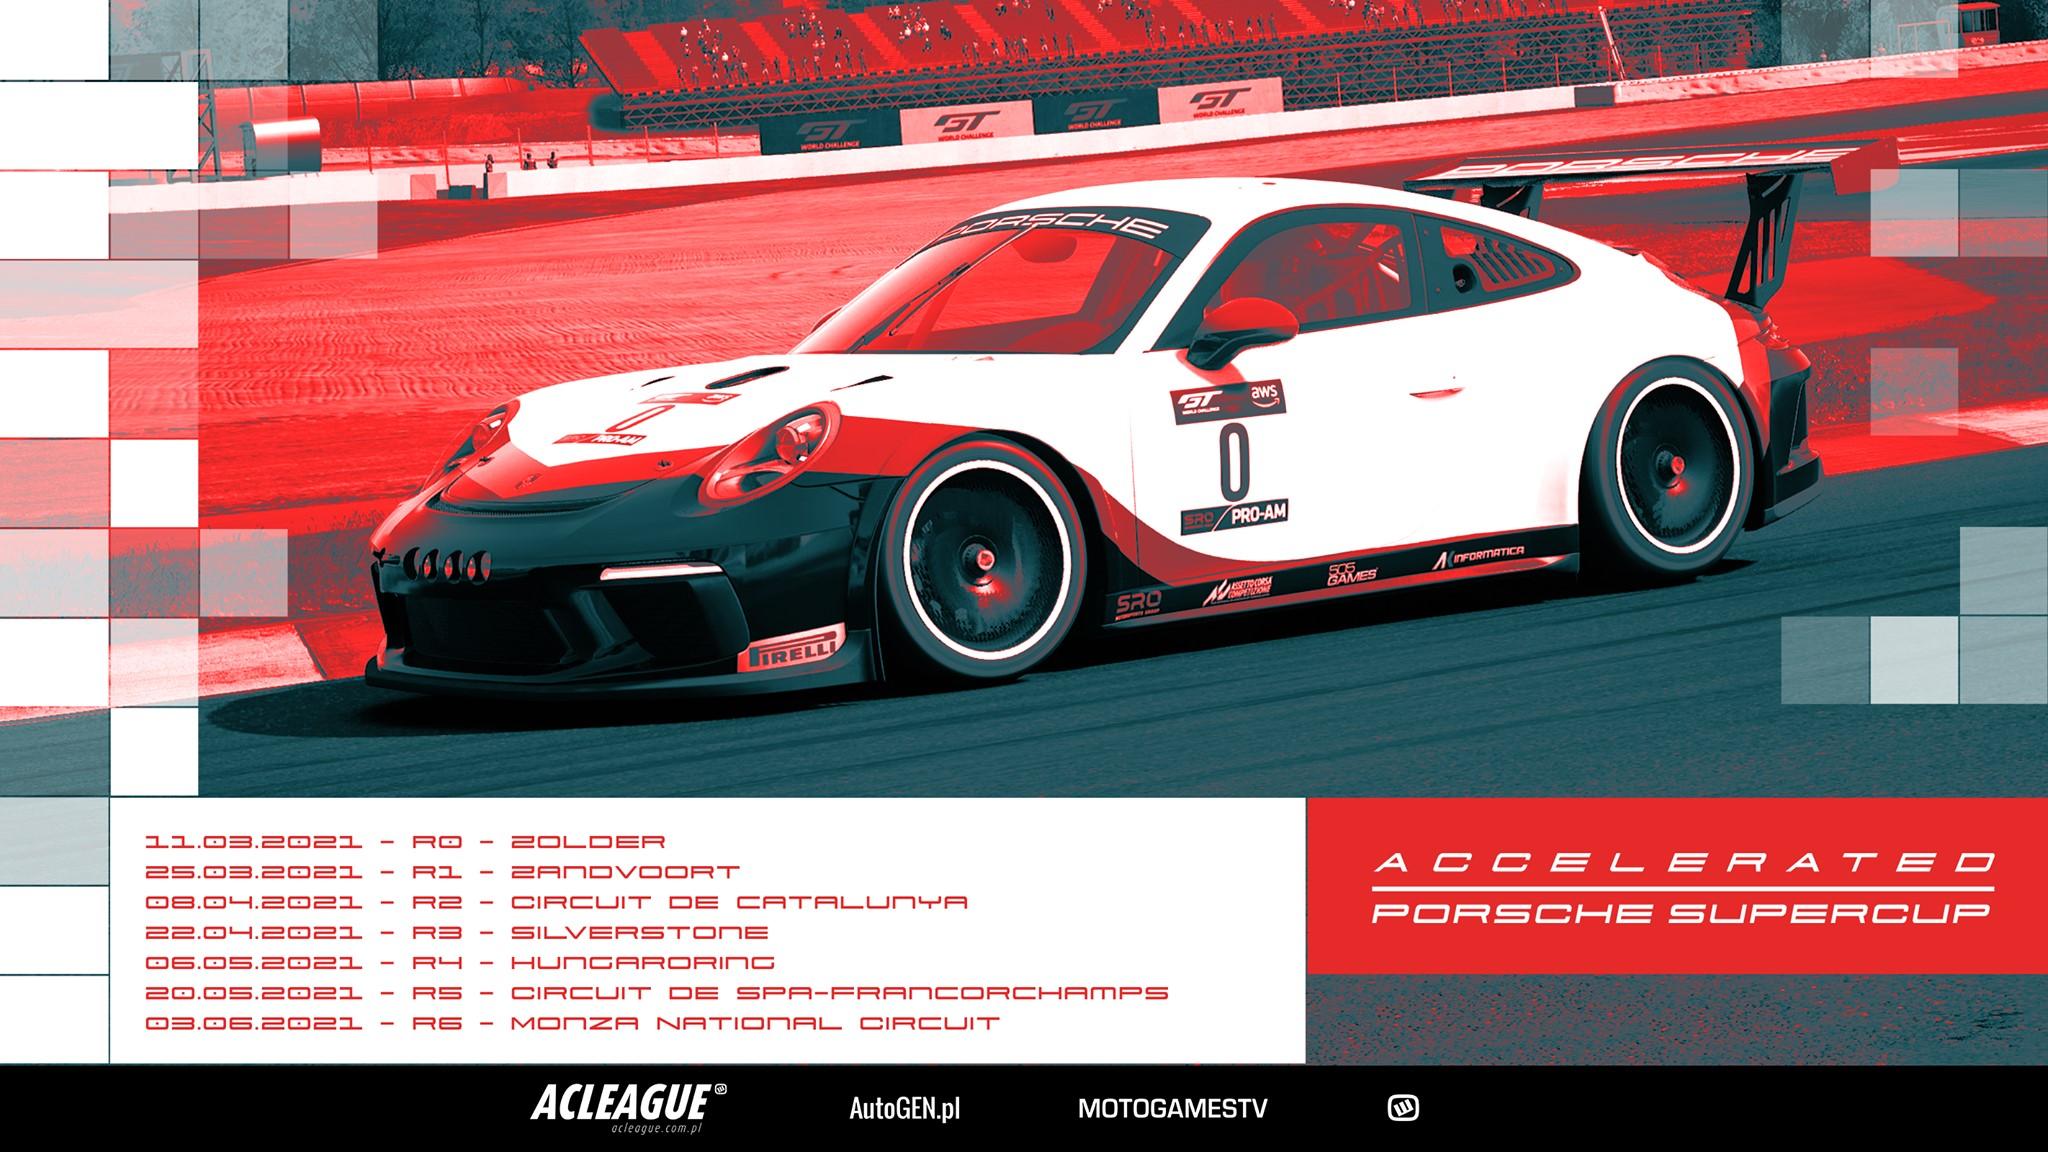 ACCelerated Porsche SuperCup